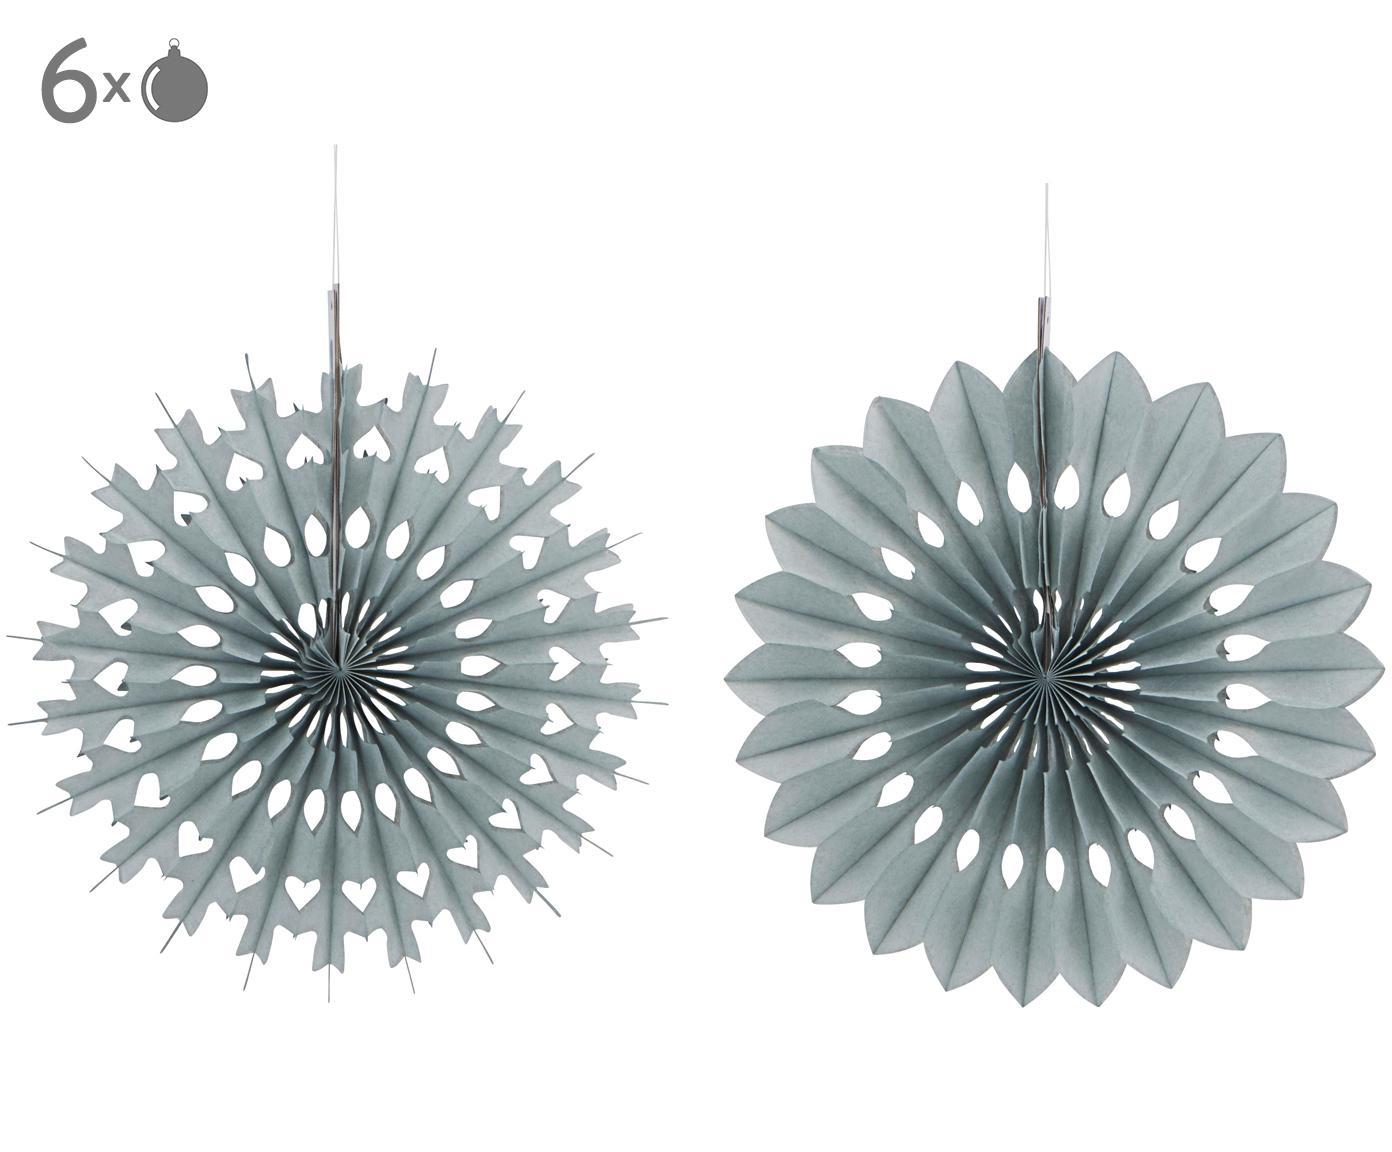 Set ciondoli decorativi Cut, 6 pz., Carta, Grigio, Ø 20 cm